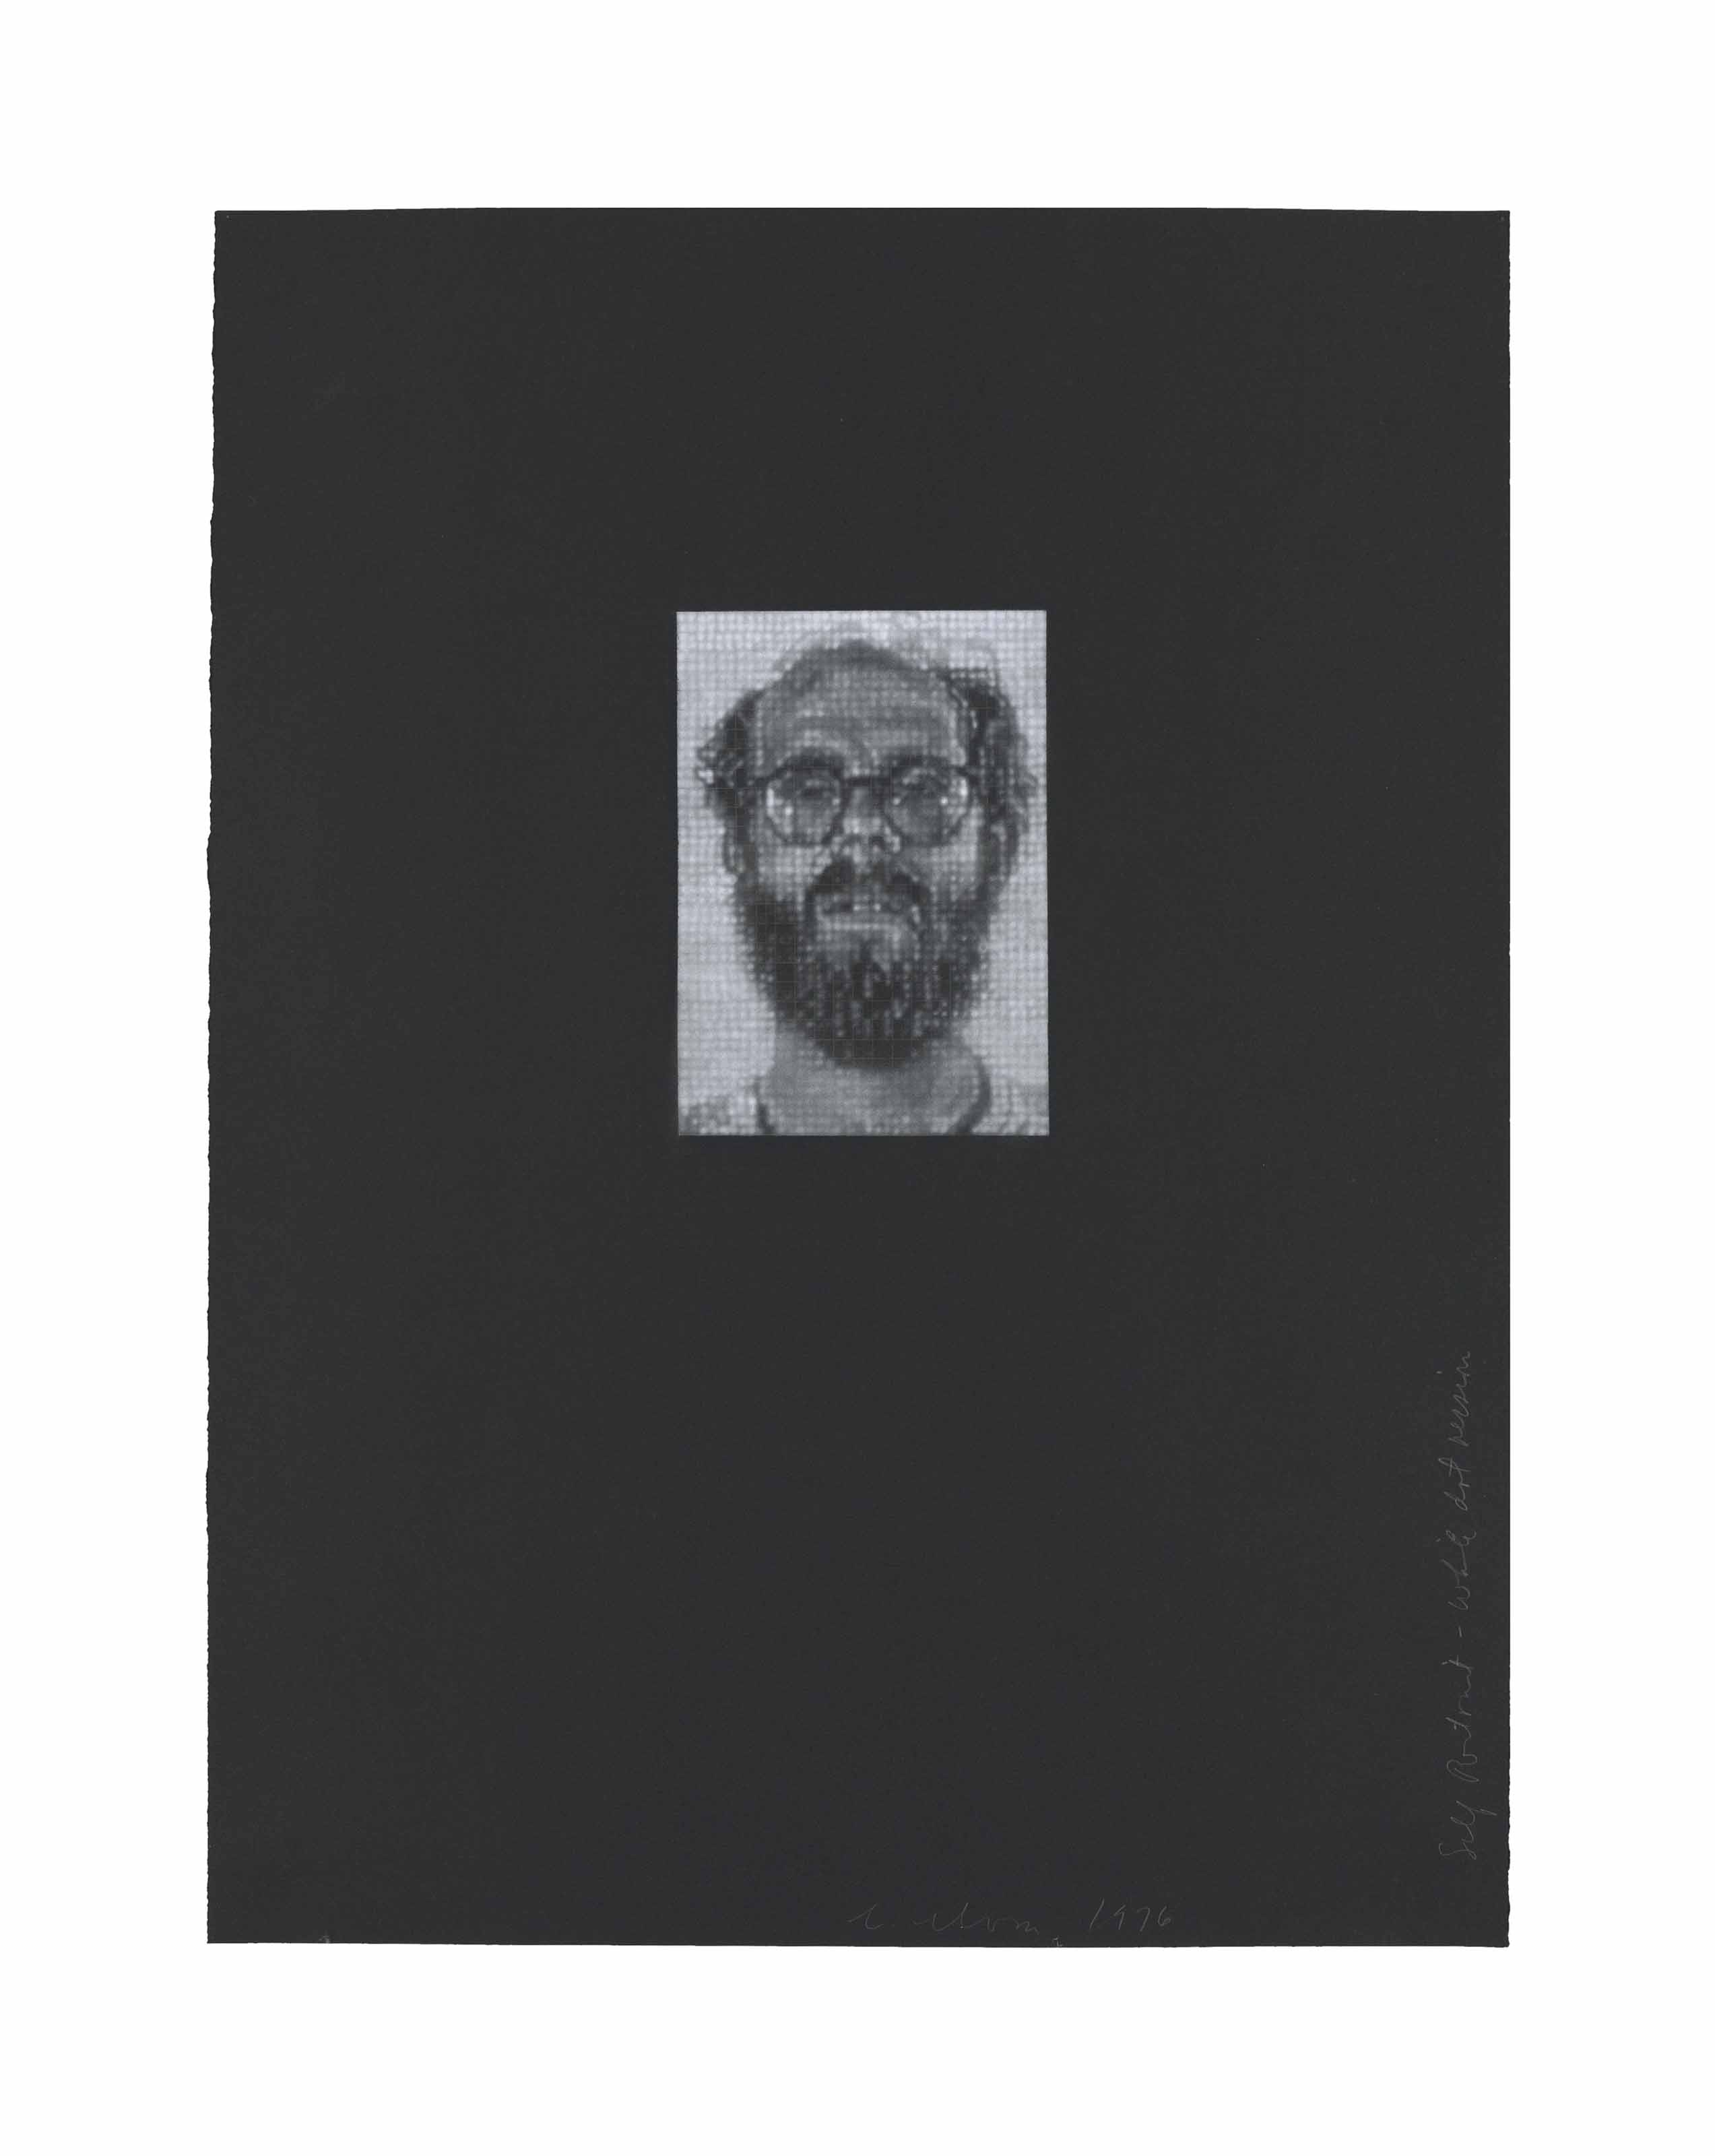 Self-Portrait/White Dot Version